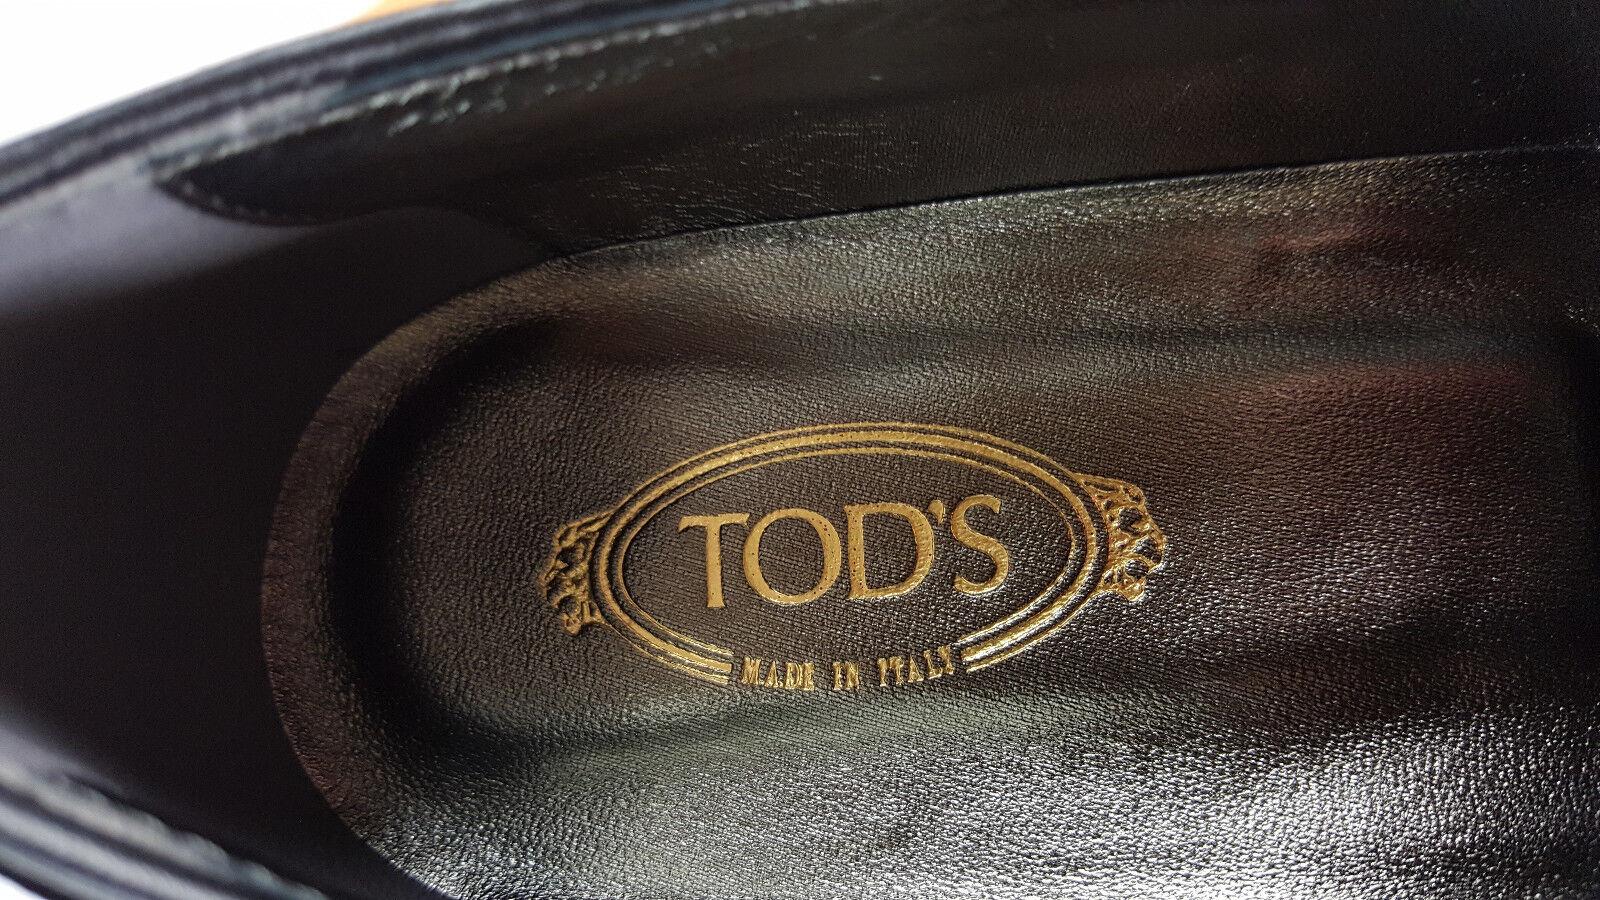 Entièrement Entièrement Entièrement neuf dans sa boîte TOD'S femme velours noir matelassé double T Bar Mocassins (UK 5.5) dbfdd4